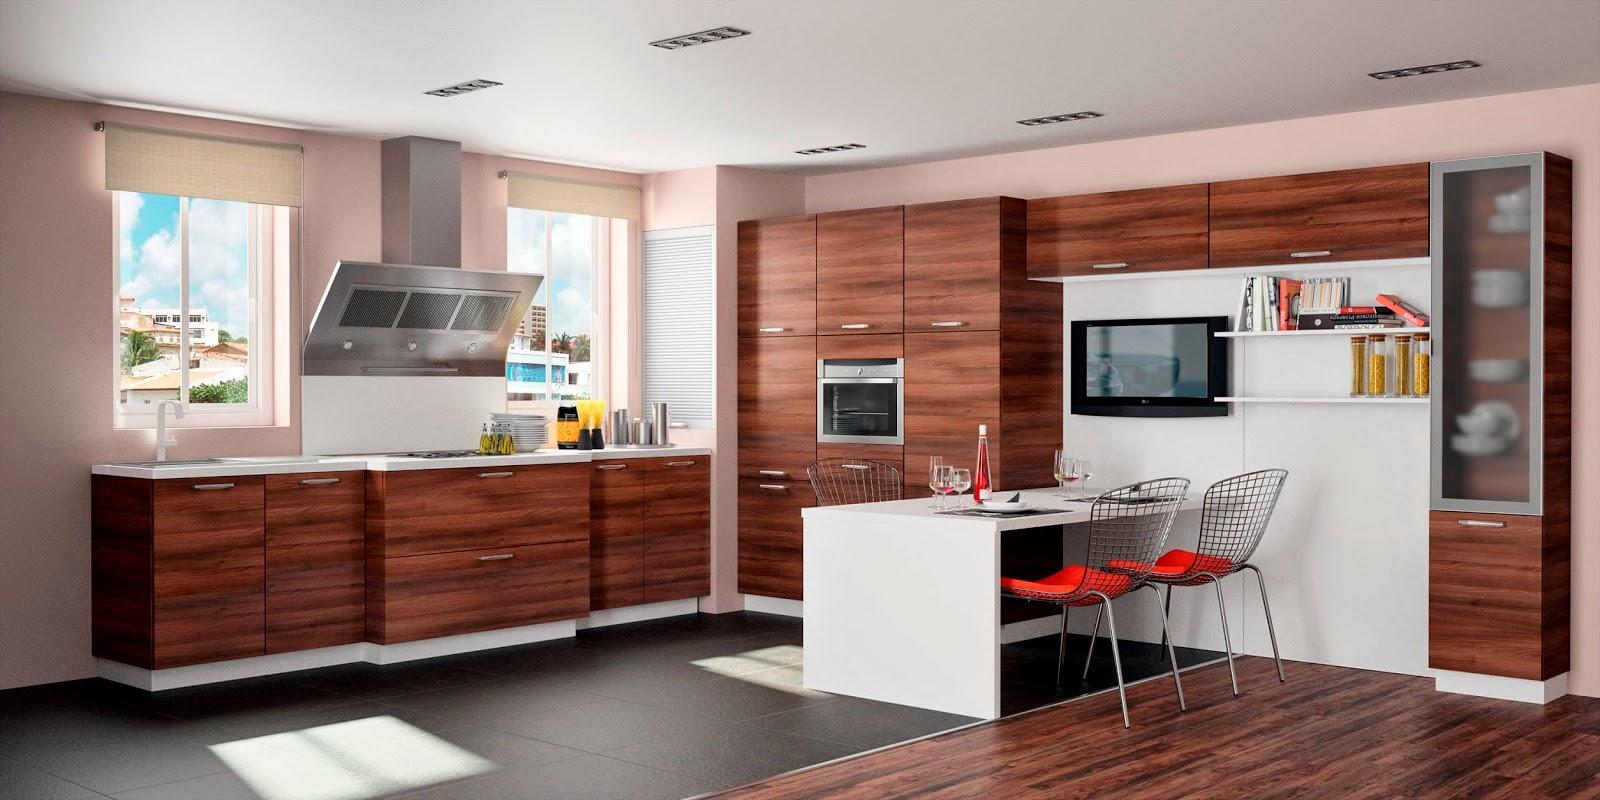 Muebles De Cocina En Melamina Good With Muebles De Cocina En  ~ Pintar Muebles De Cocina De Melamina